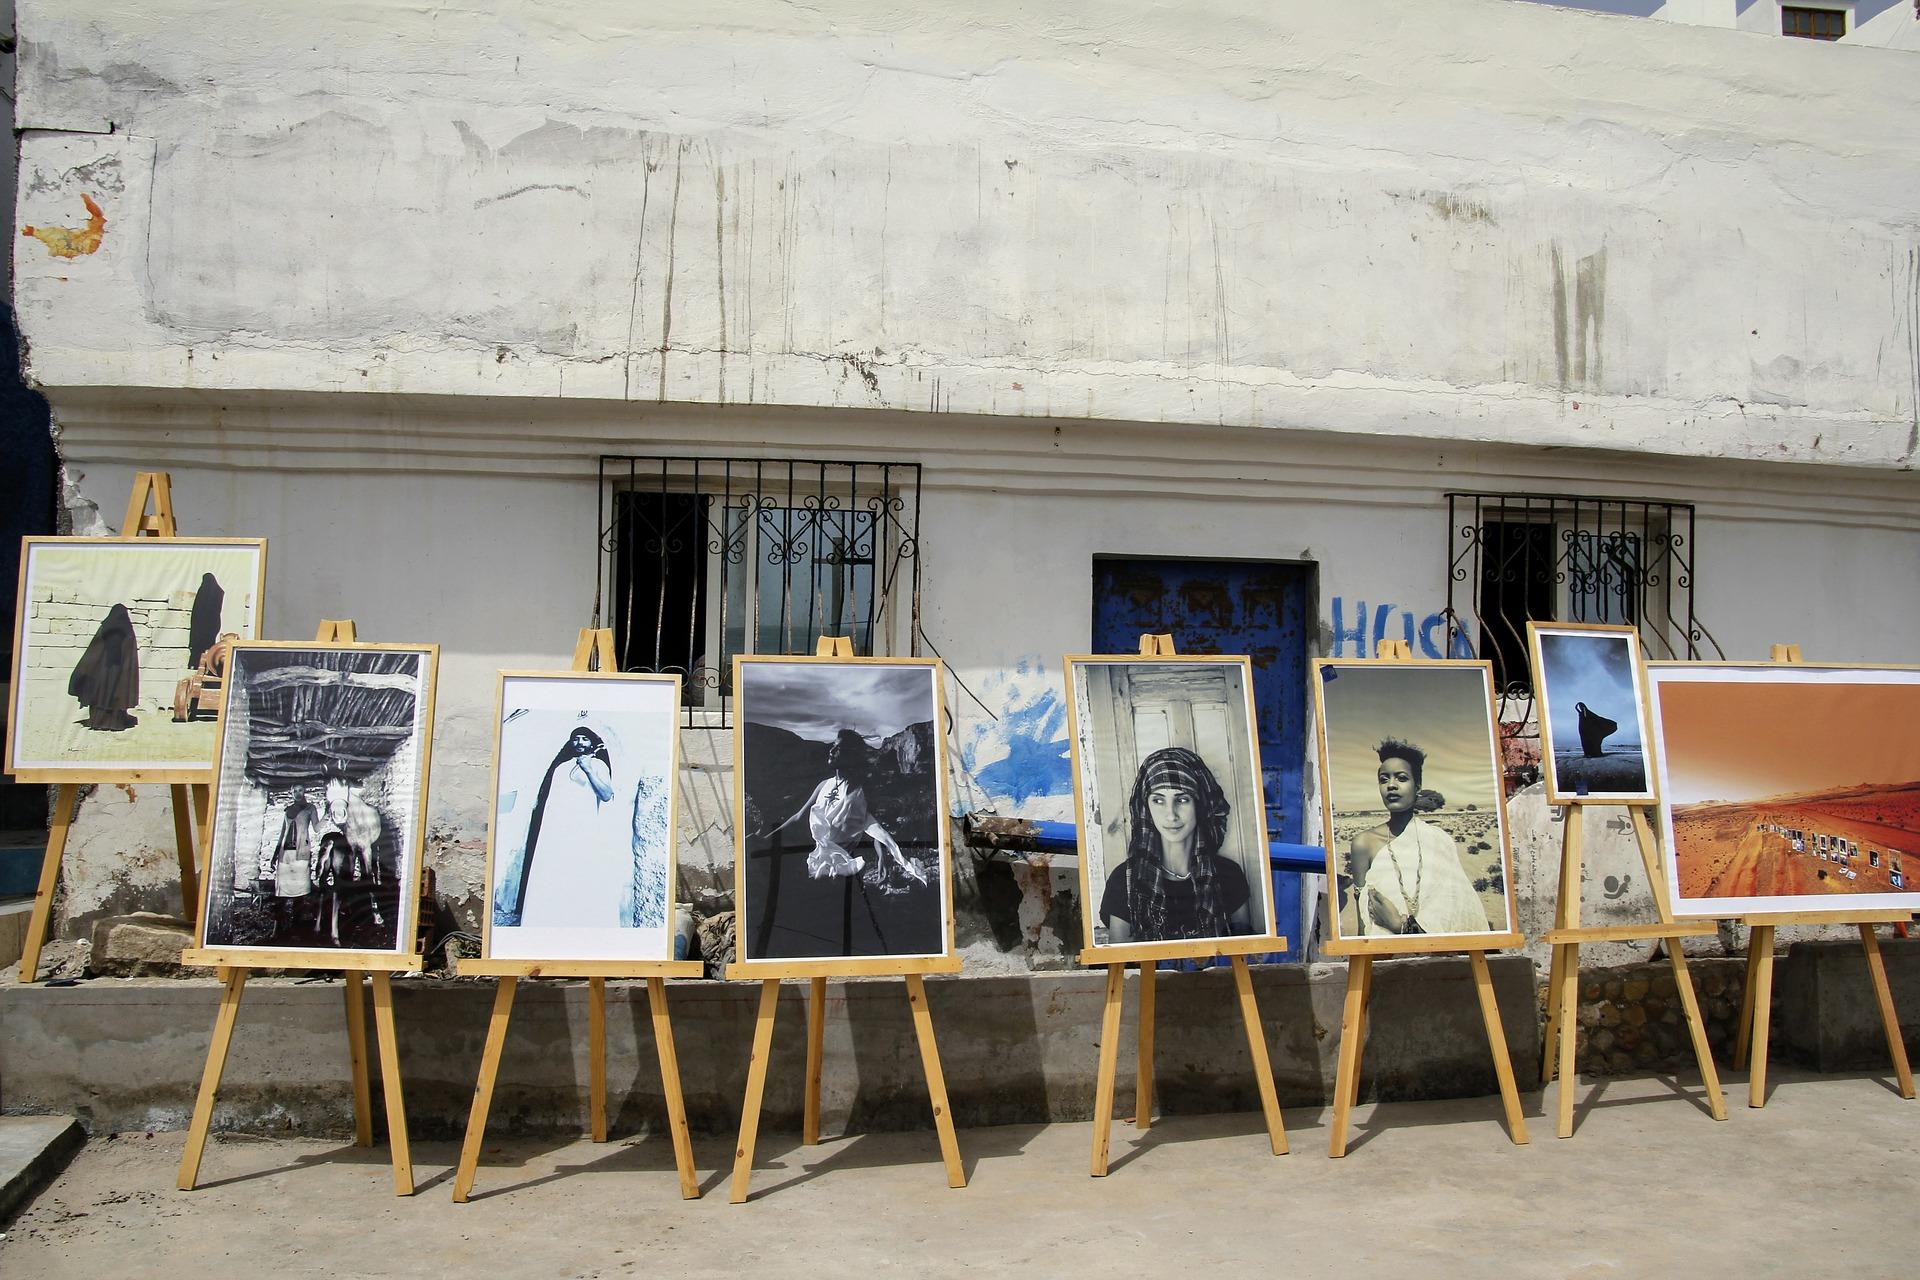 photography institute in panjagutta